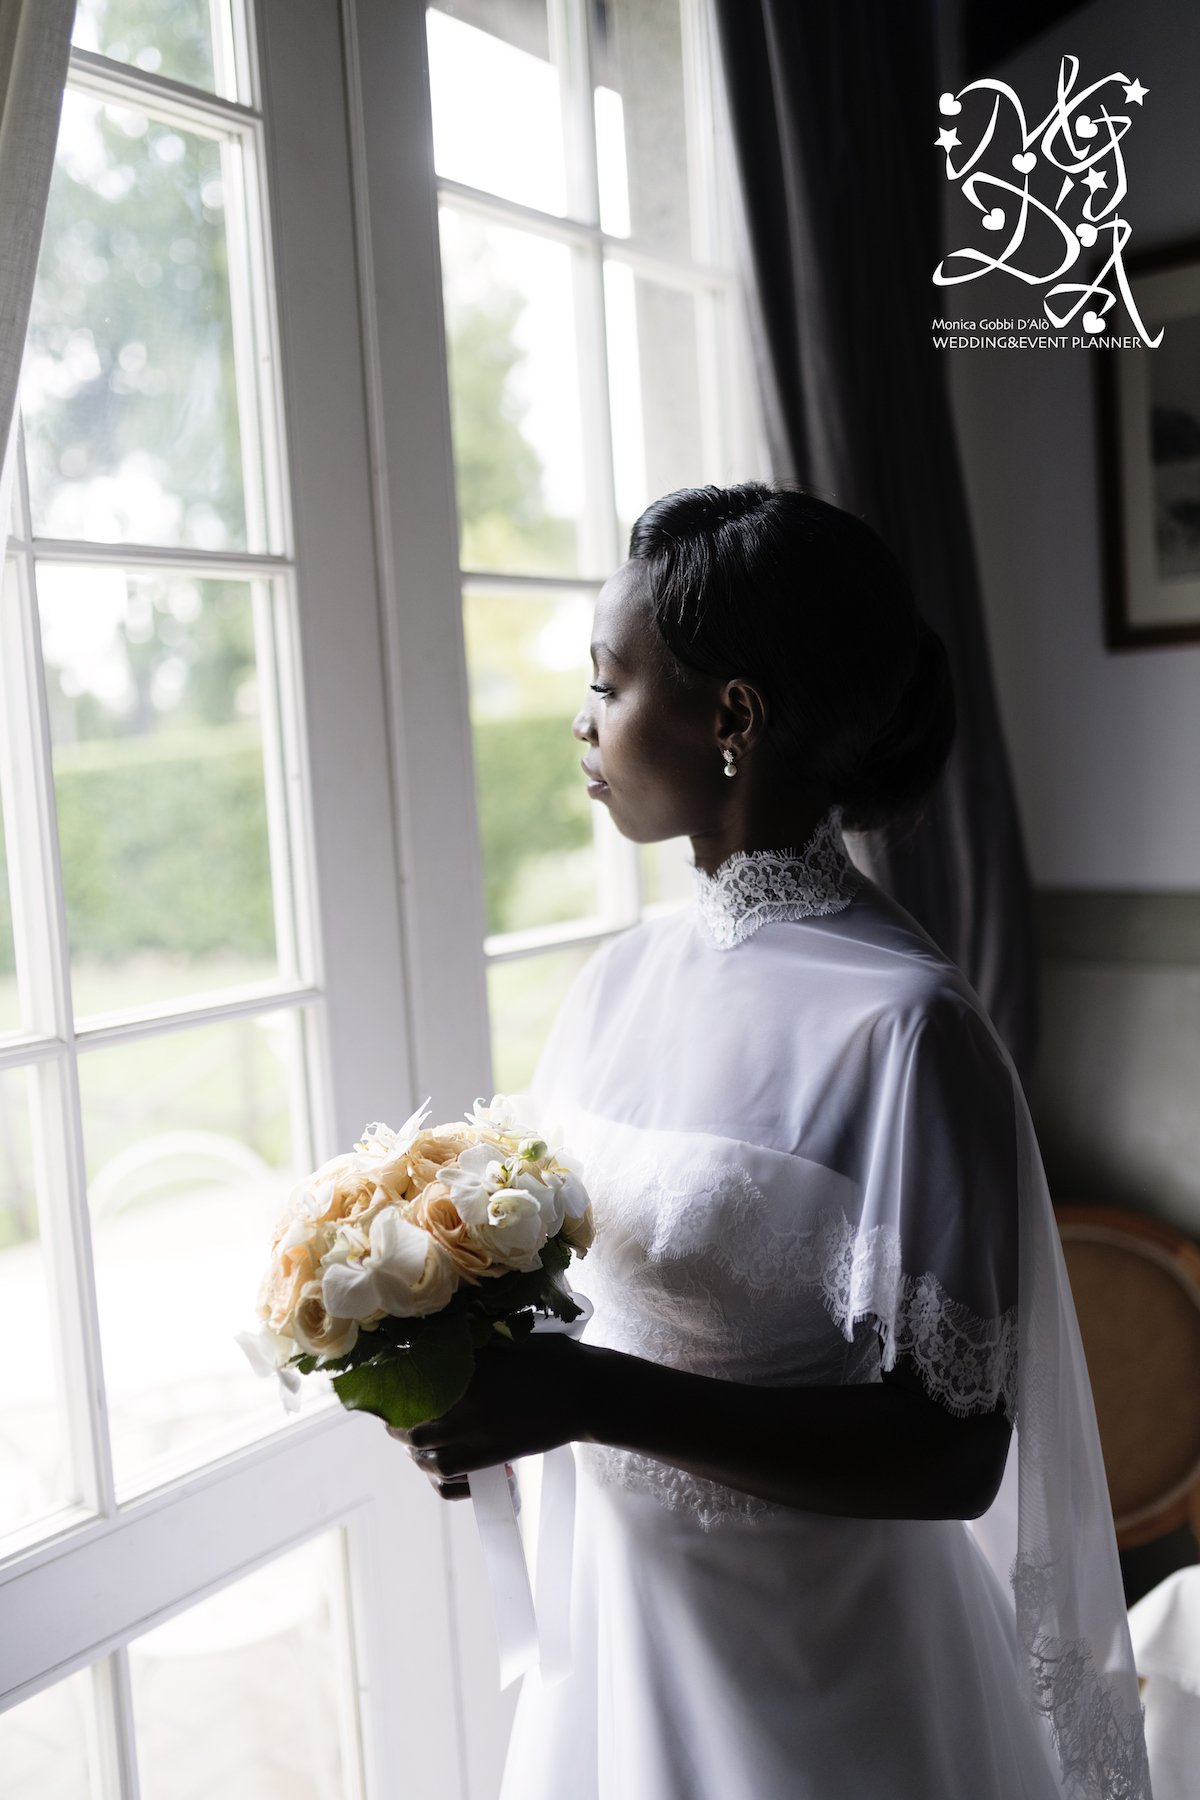 Matrimonio In Kenia : Rovazzi in kenya con amore u new images magazine